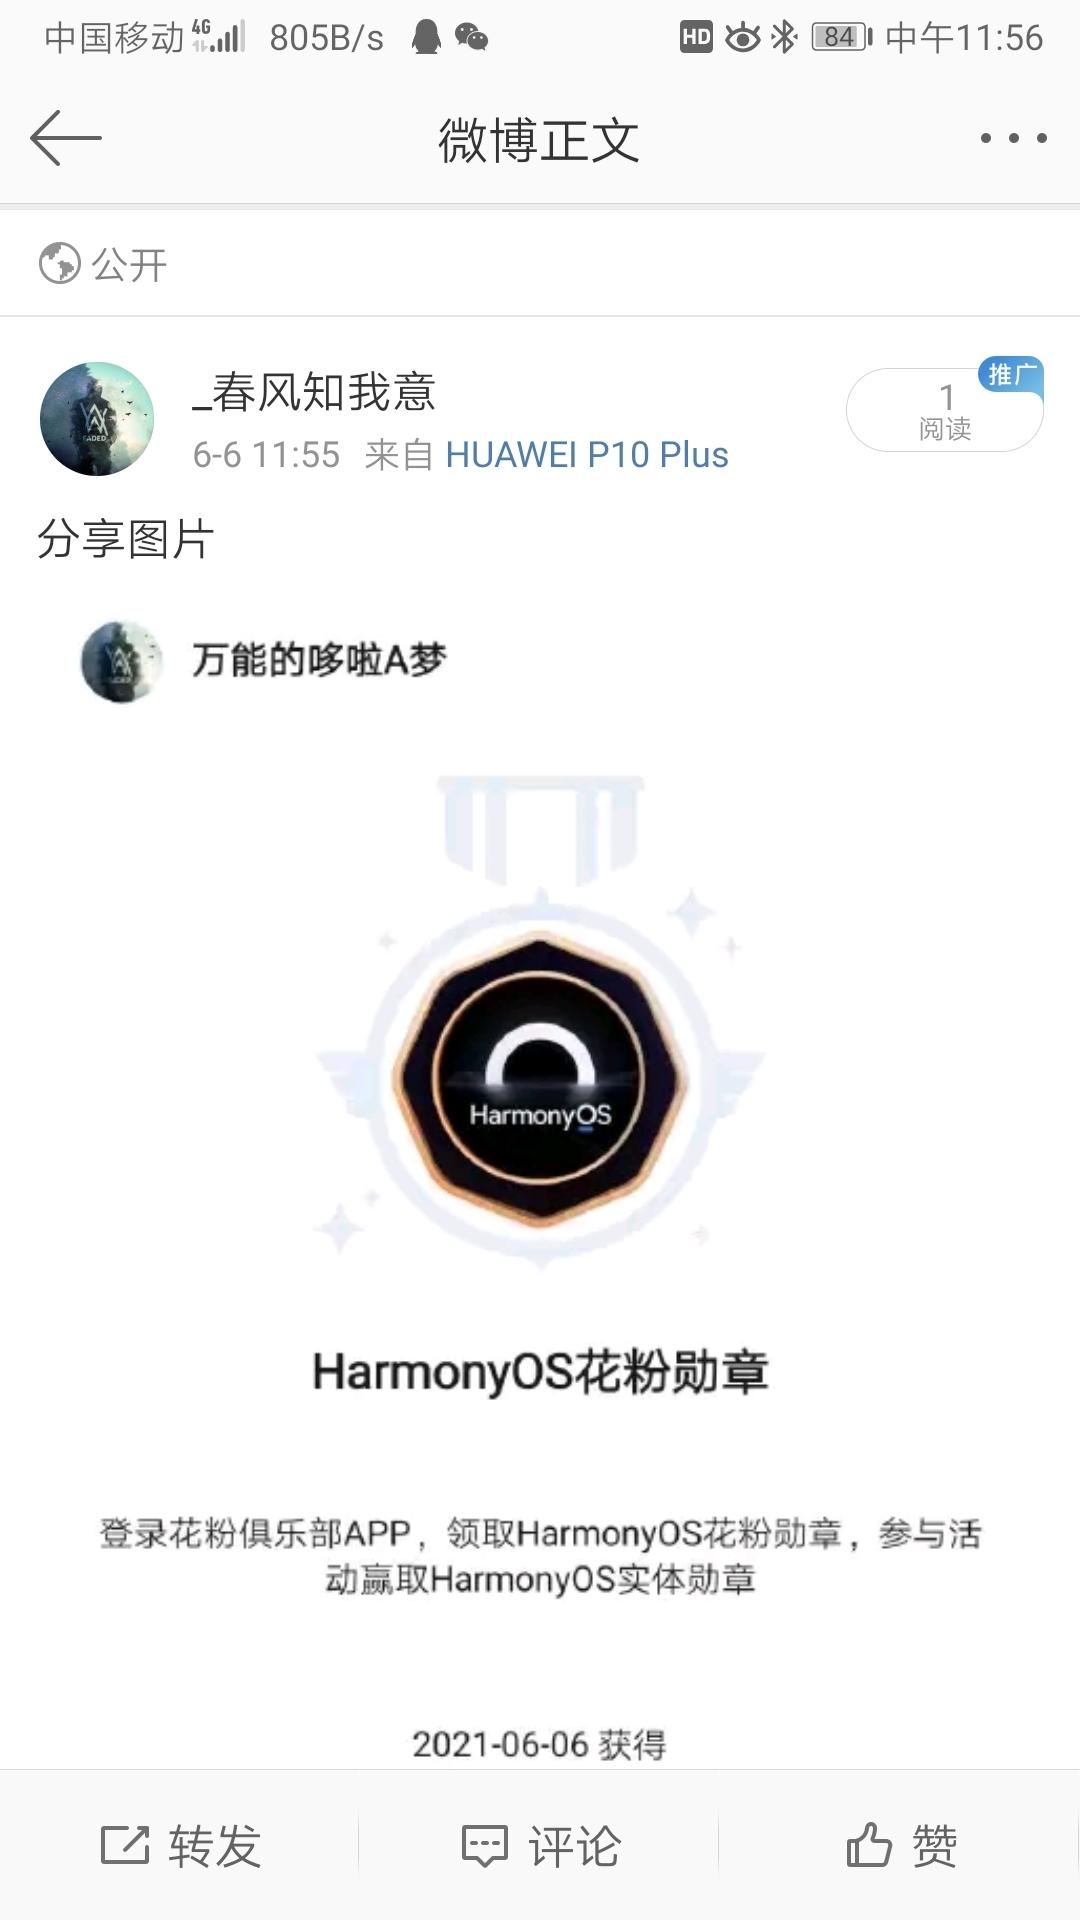 Screenshot_20210606_115629_com.sina.weibo.jpg